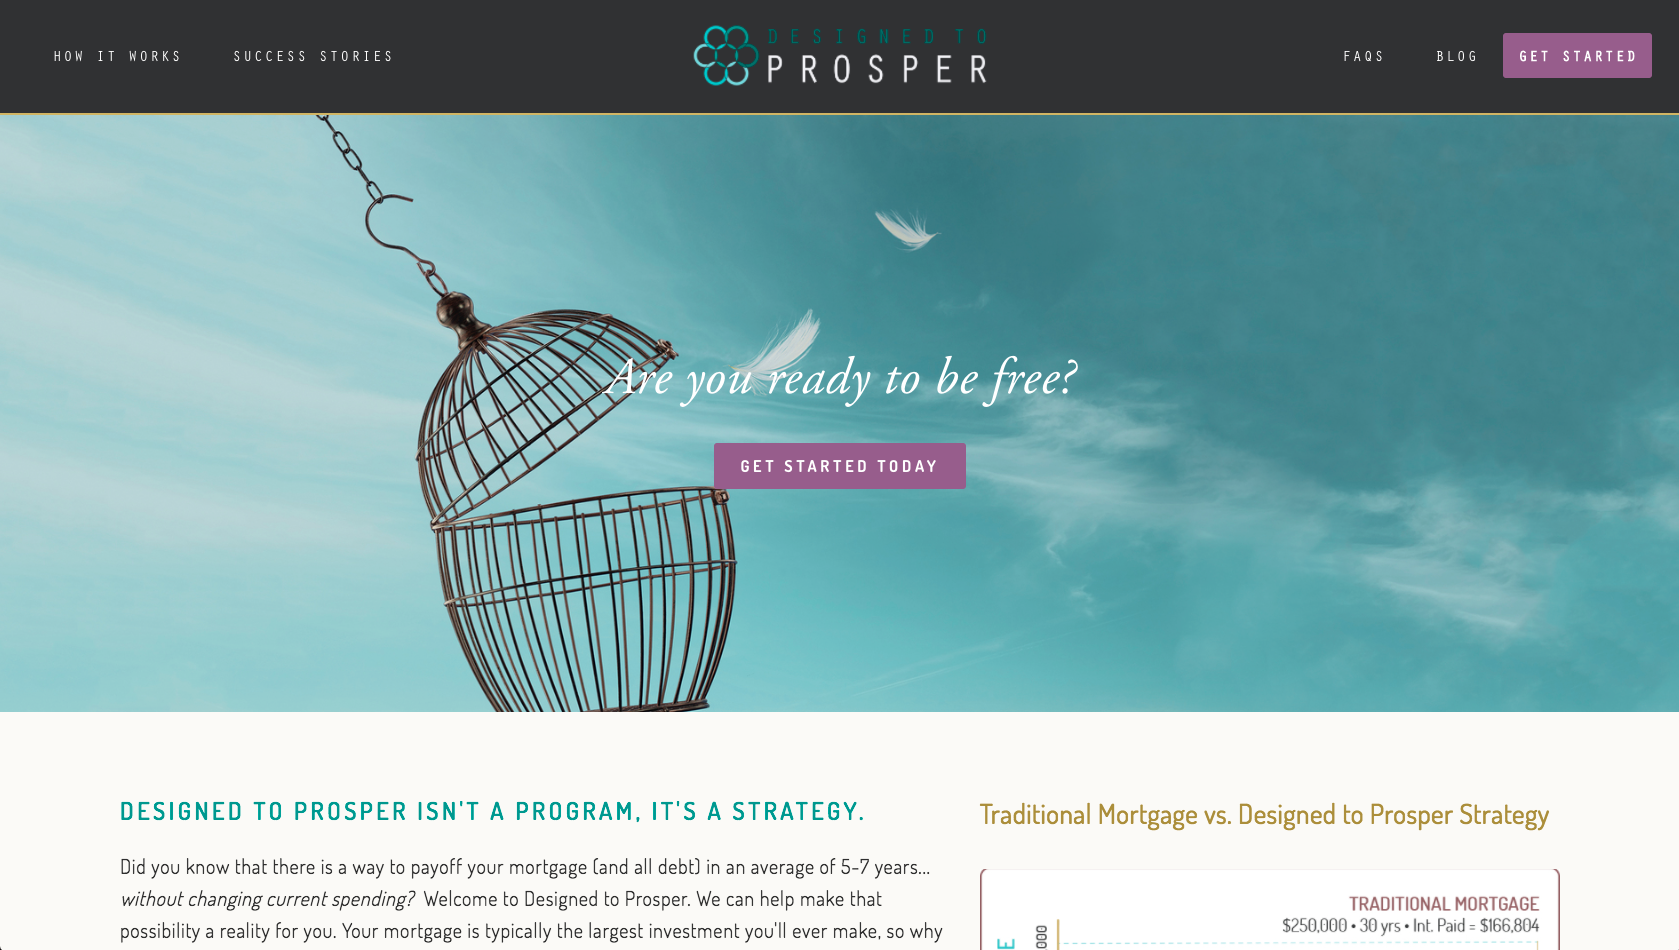 Designed to Prosper